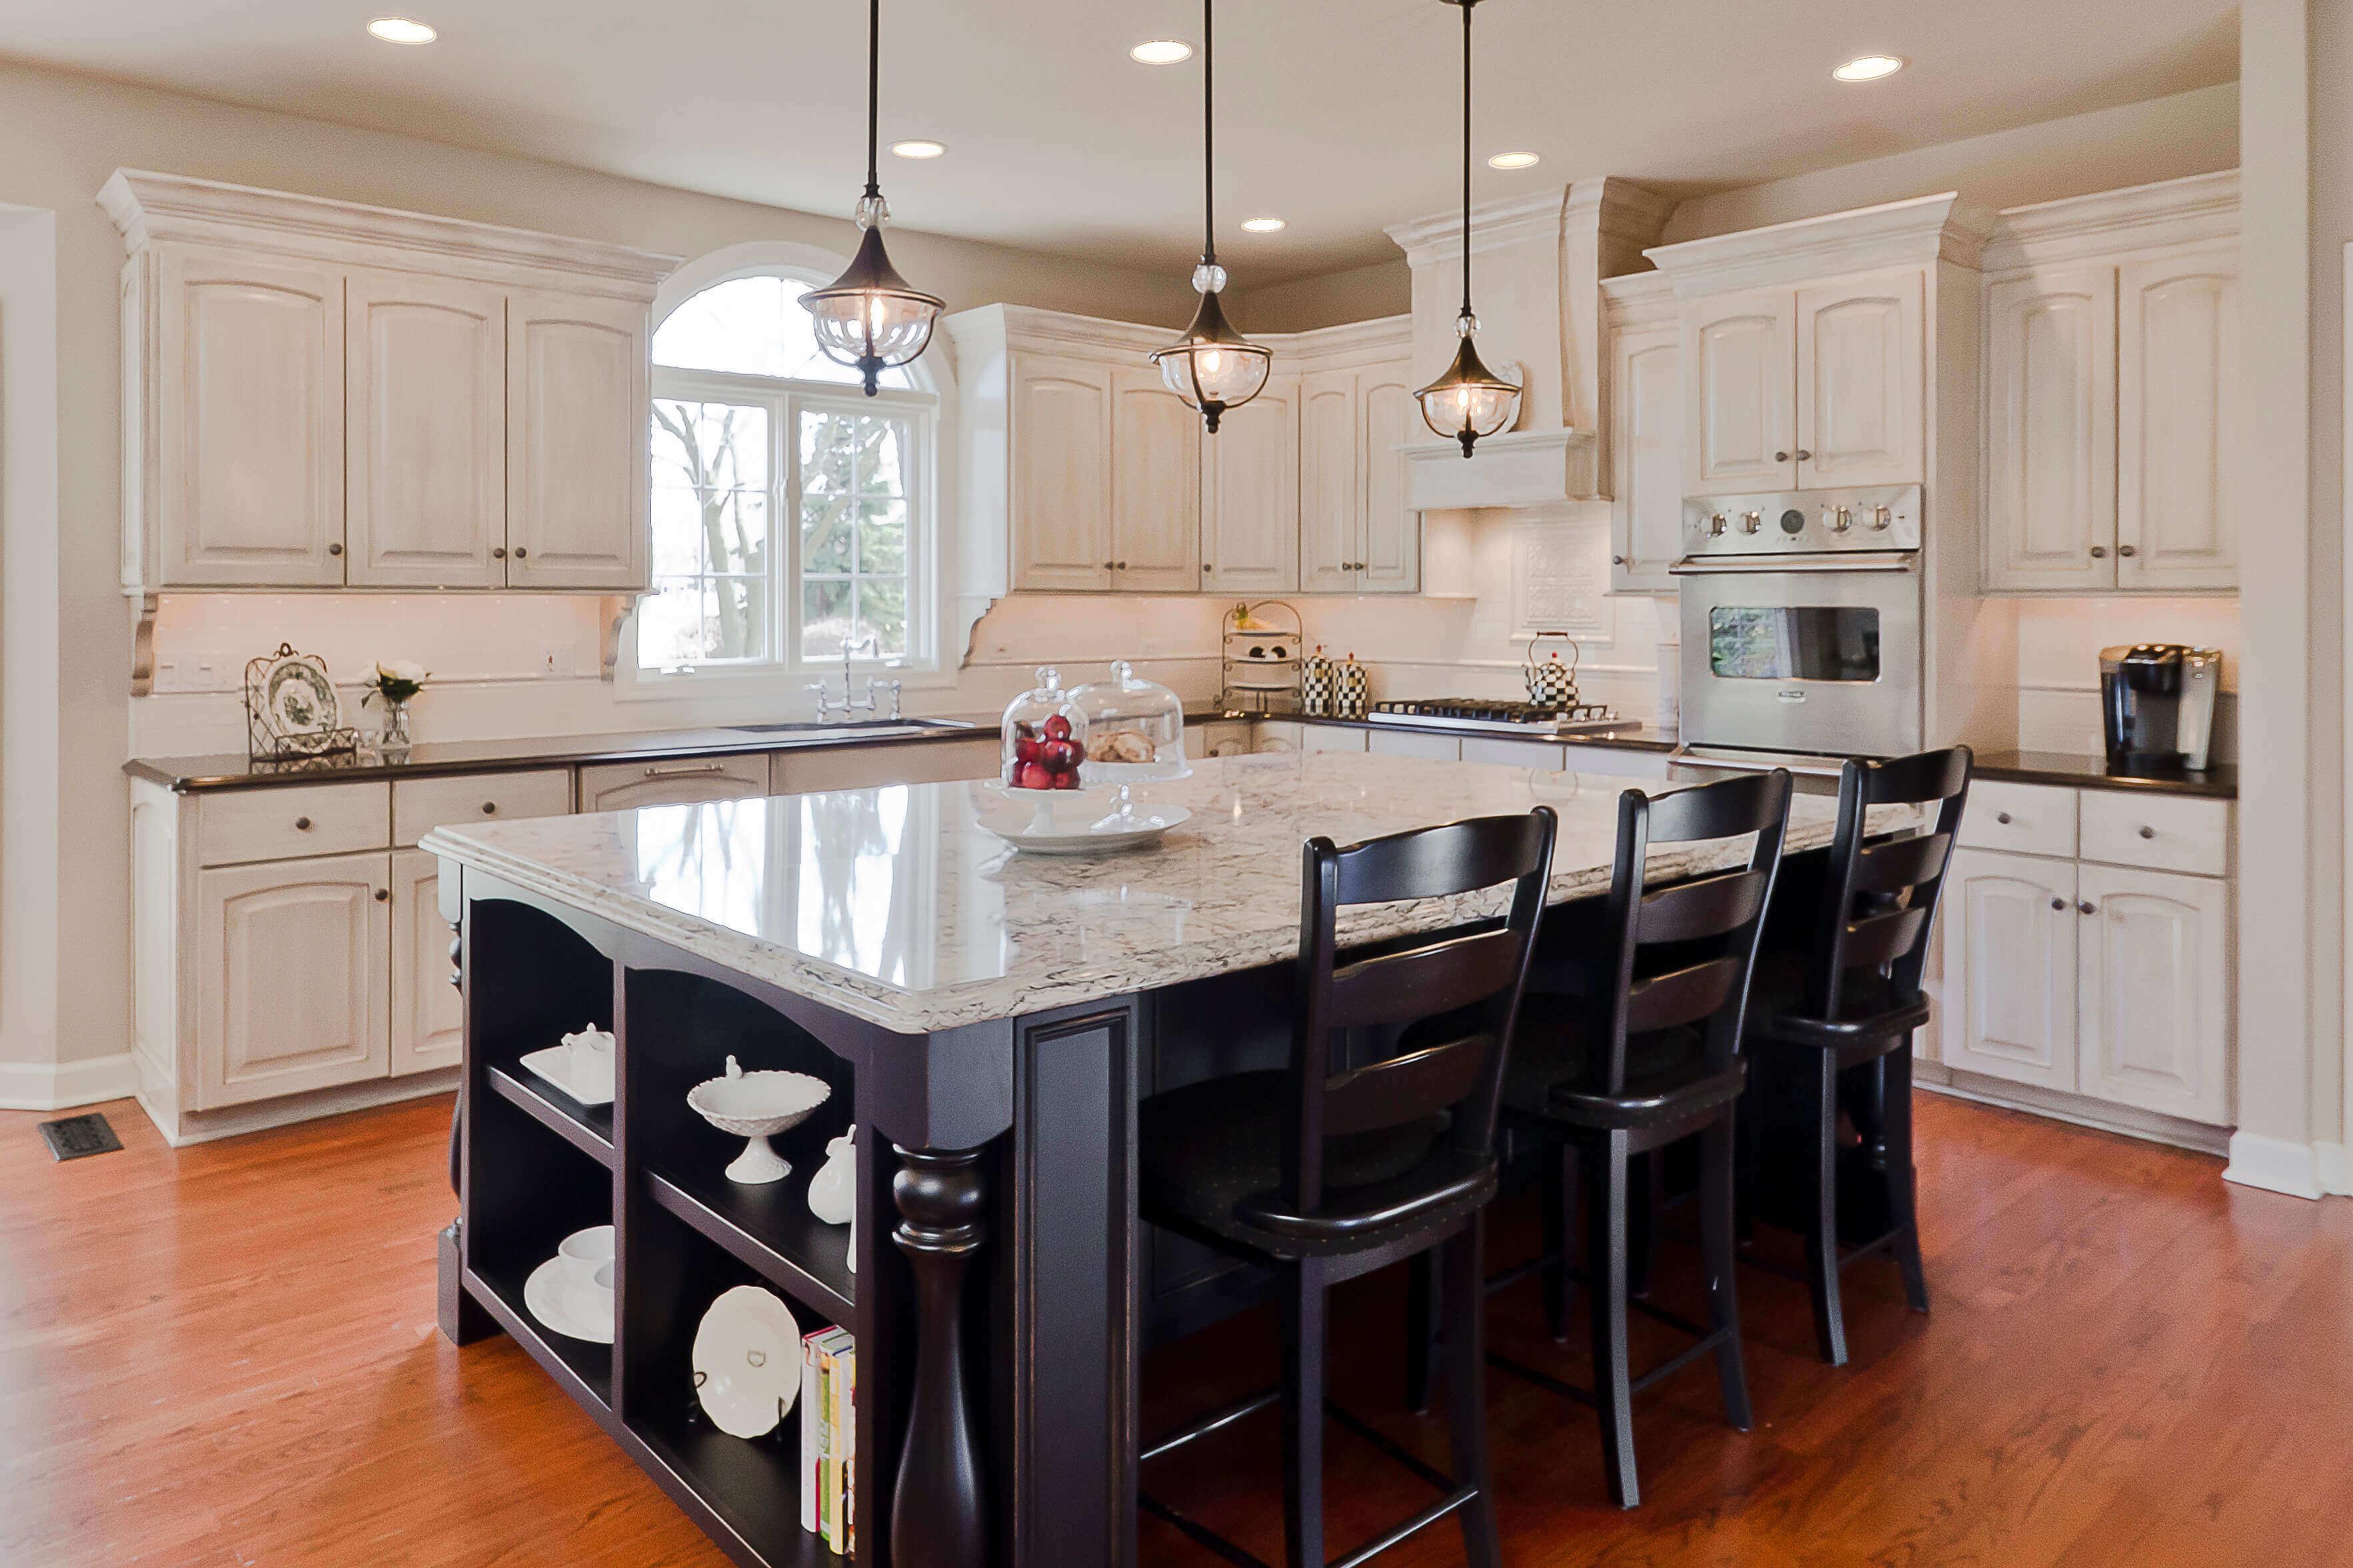 78+ Great Looking Modern Kitchen Gallery